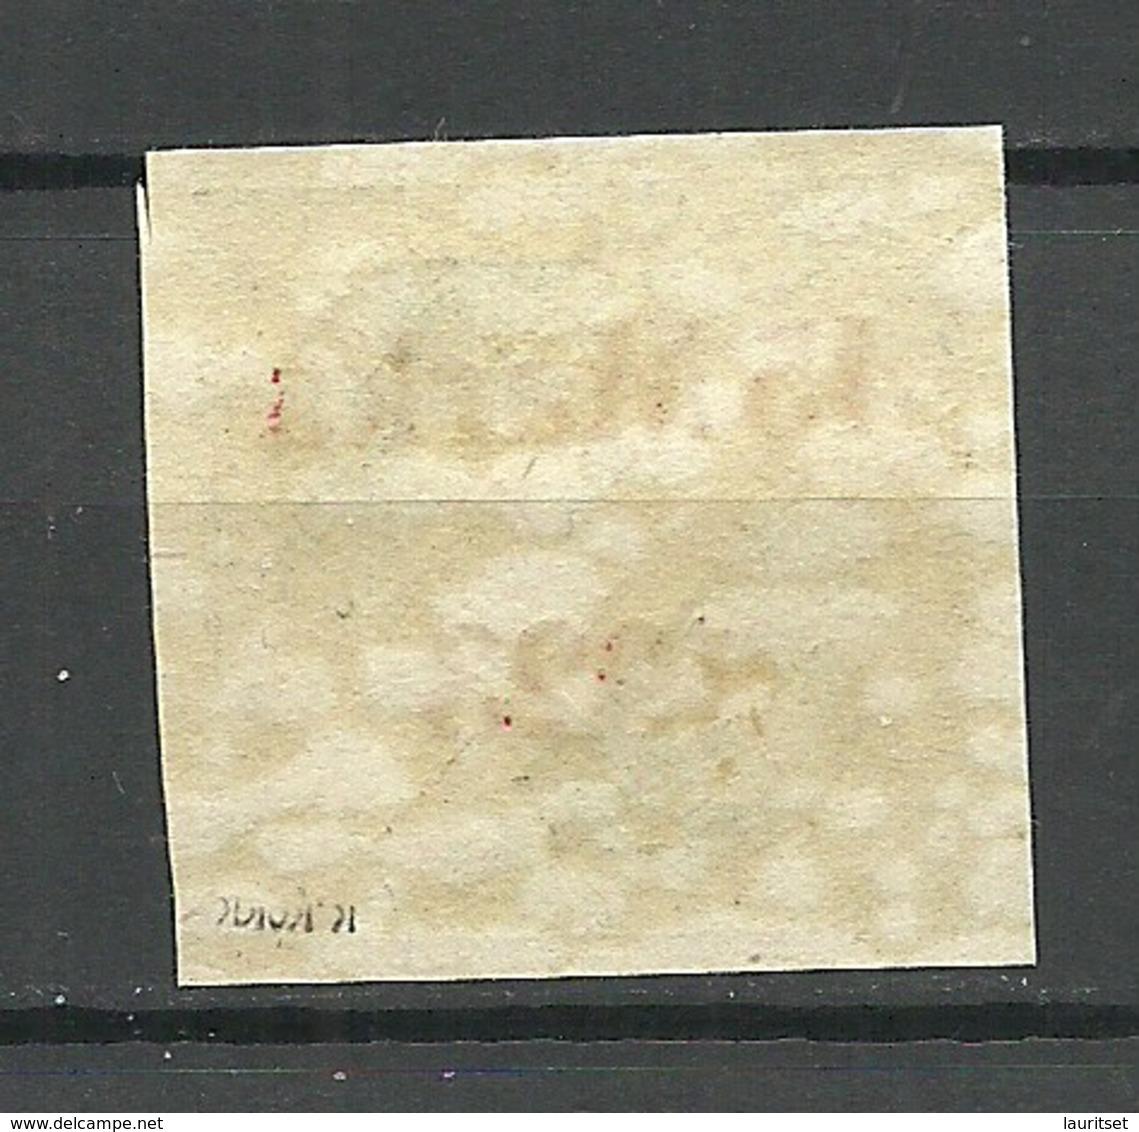 Estland Estonia 1923 Michel 41 - 45 * Mi 45 Is Expertized & Signed K. Kokk - Estland